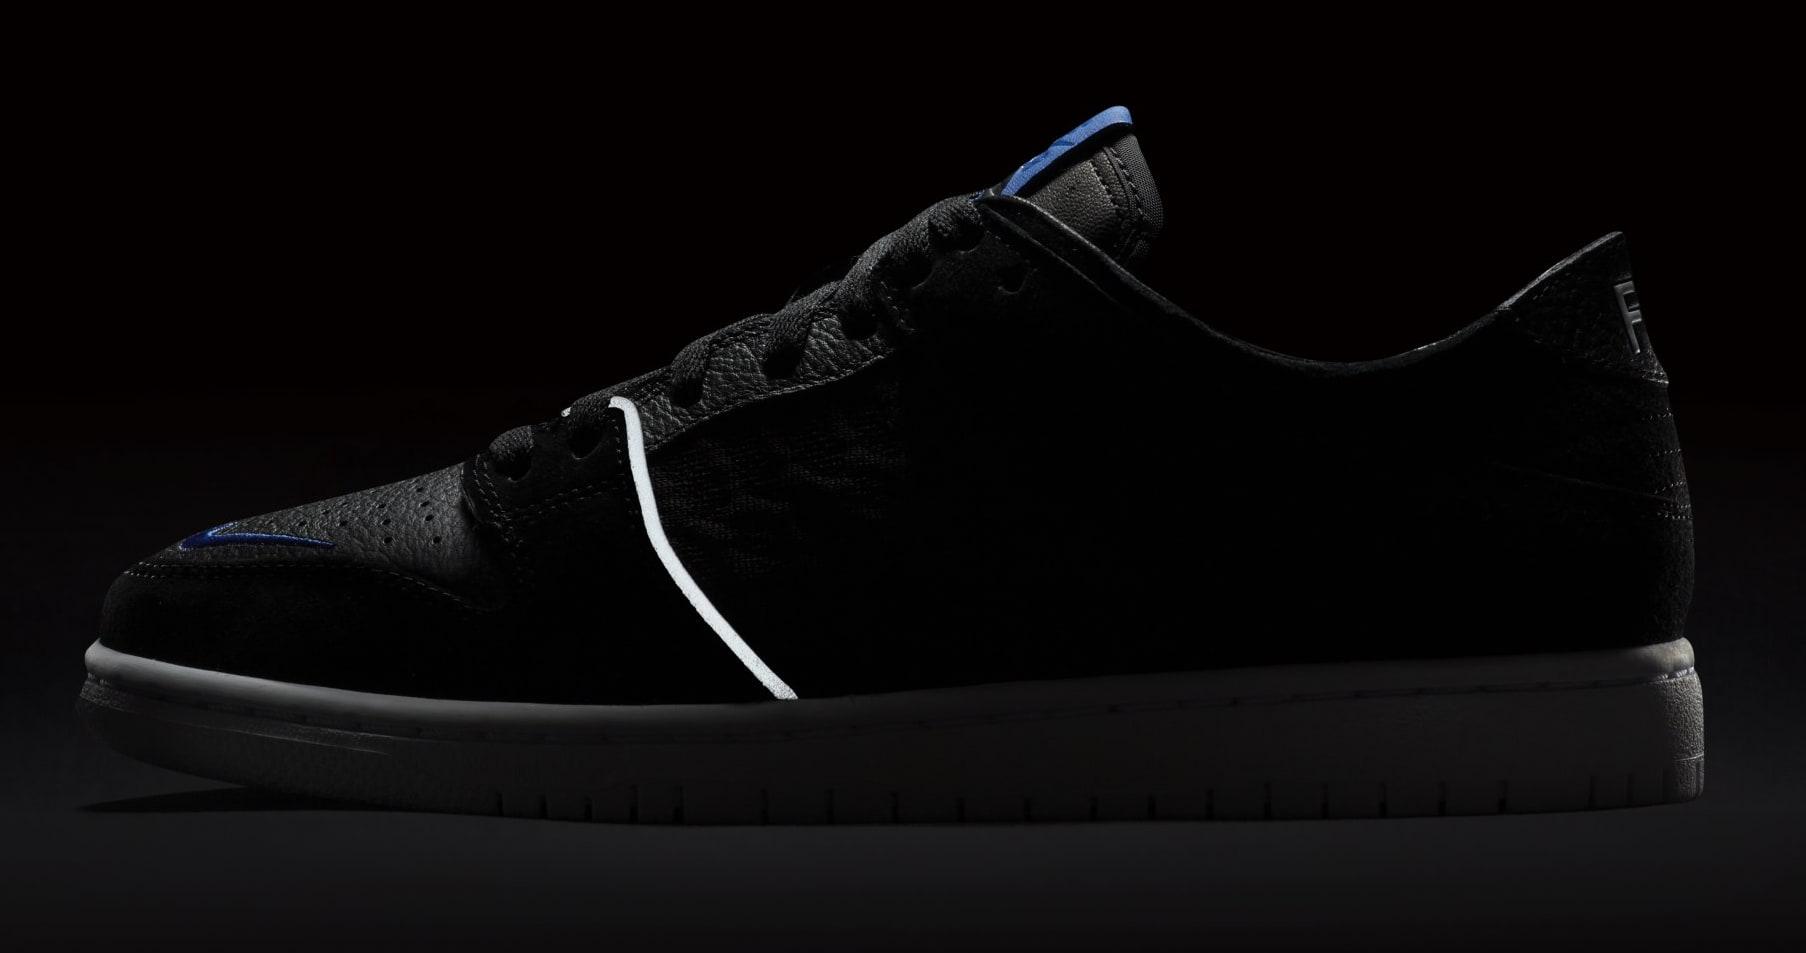 Soulland x Nike SB Dunk Low 918288-041 (3M)